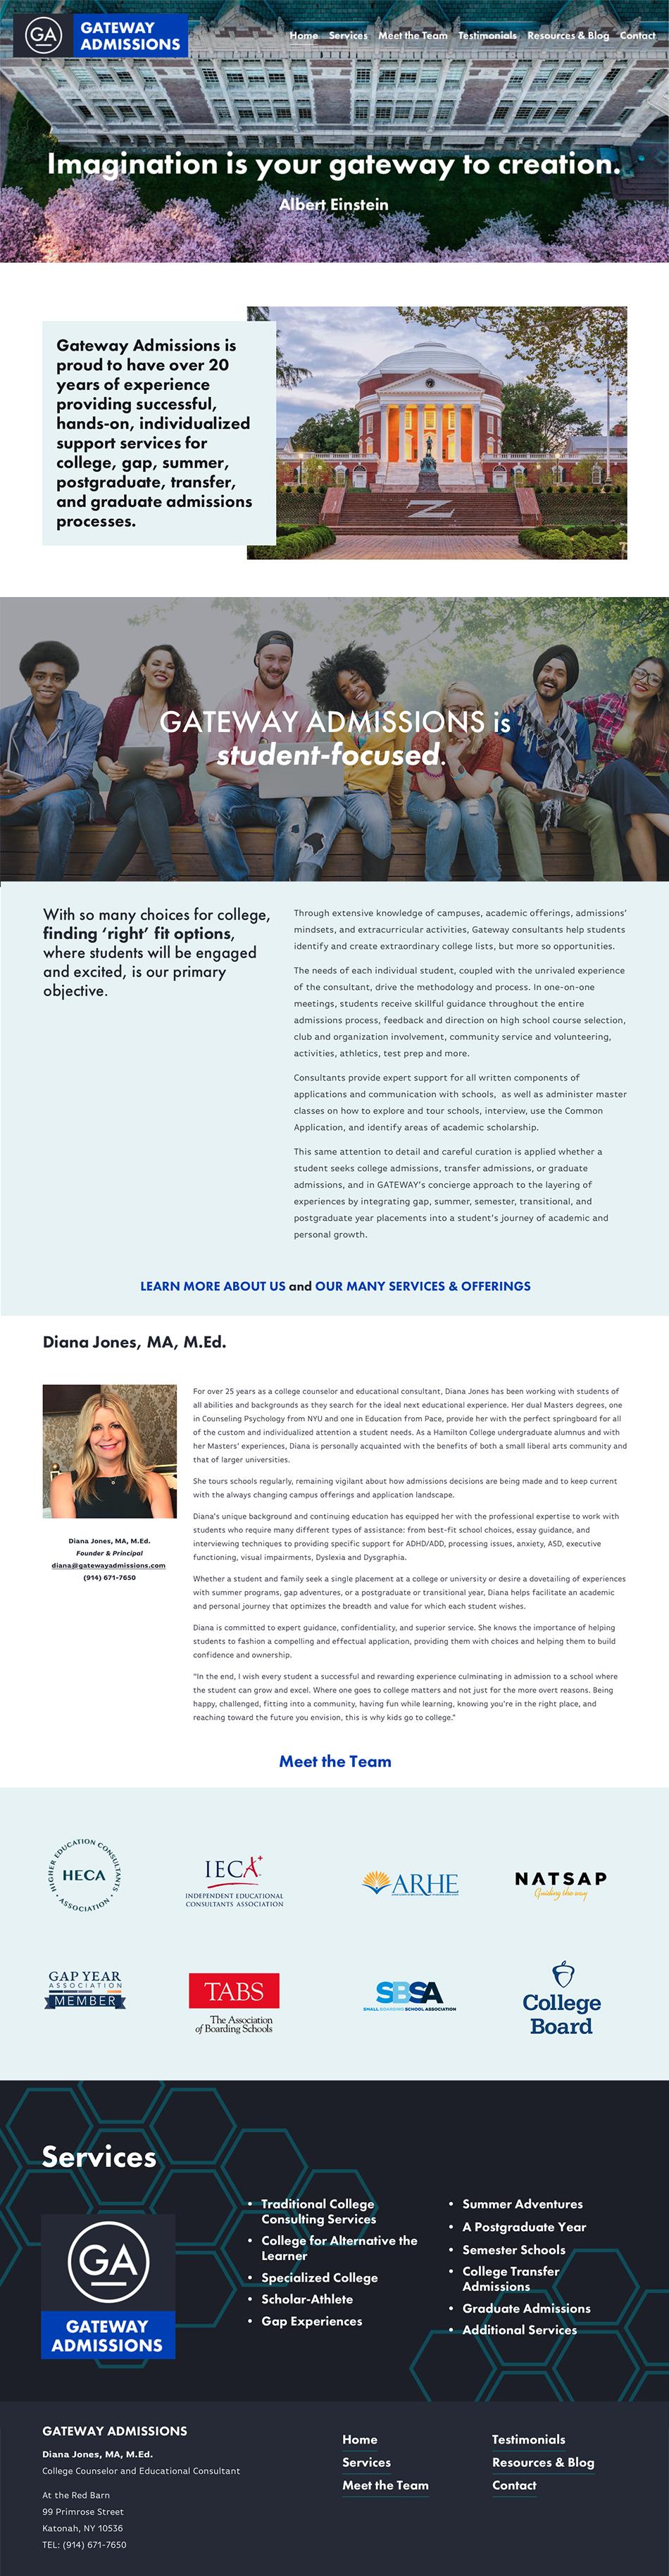 Gateway Admissions website